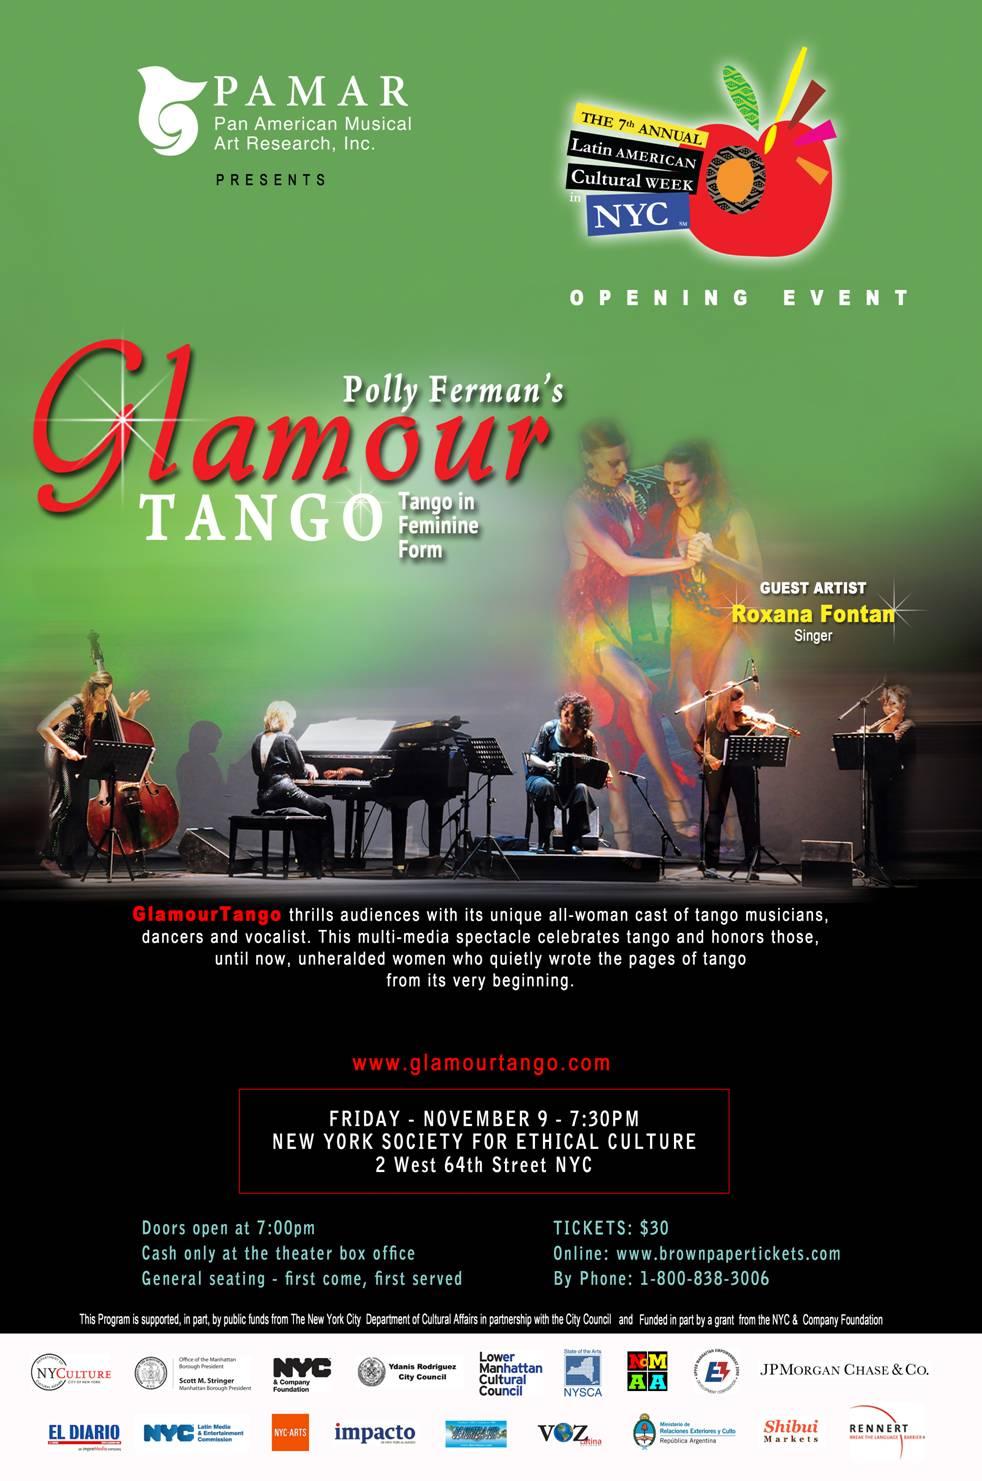 GlamourTango: Tango in Feminine Form